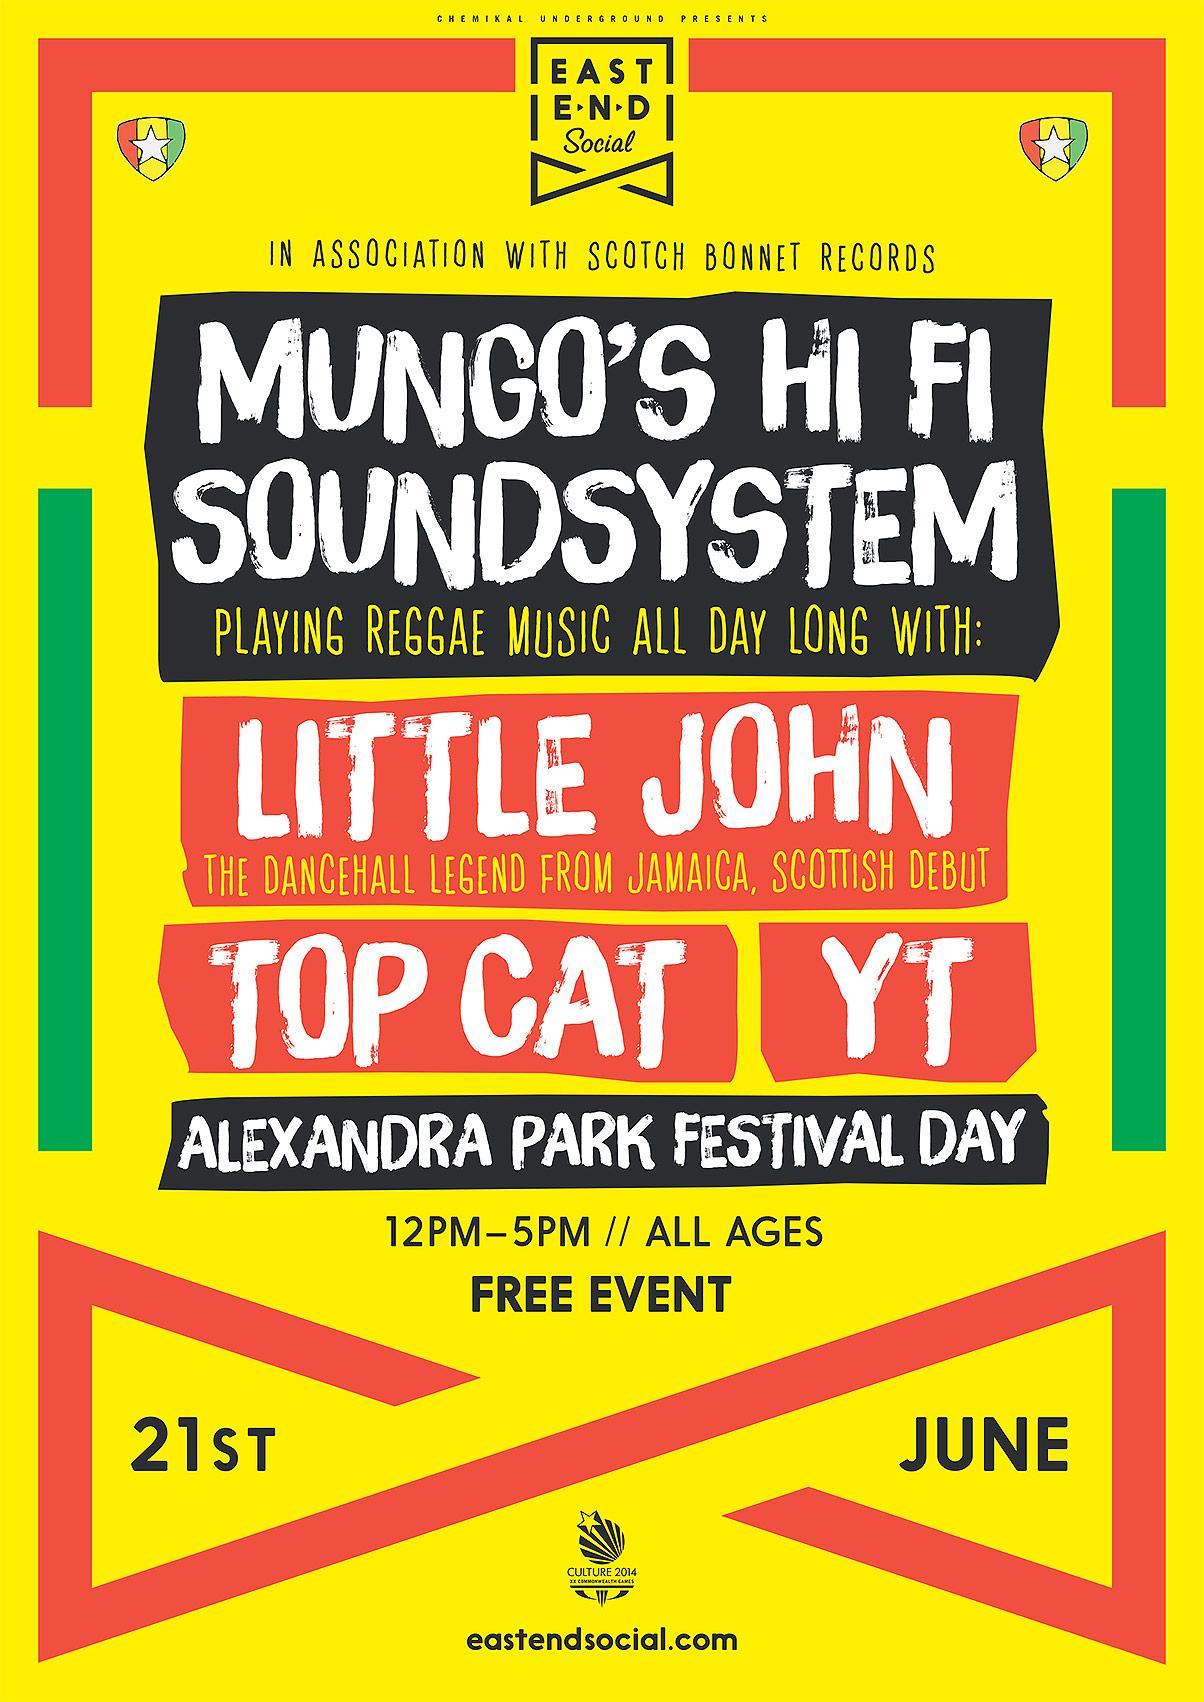 Mungo's Hi Fi Soundsystem ft. Little John, Top Cat & YT at Alexandra Park Glasgow on 21st June 2014